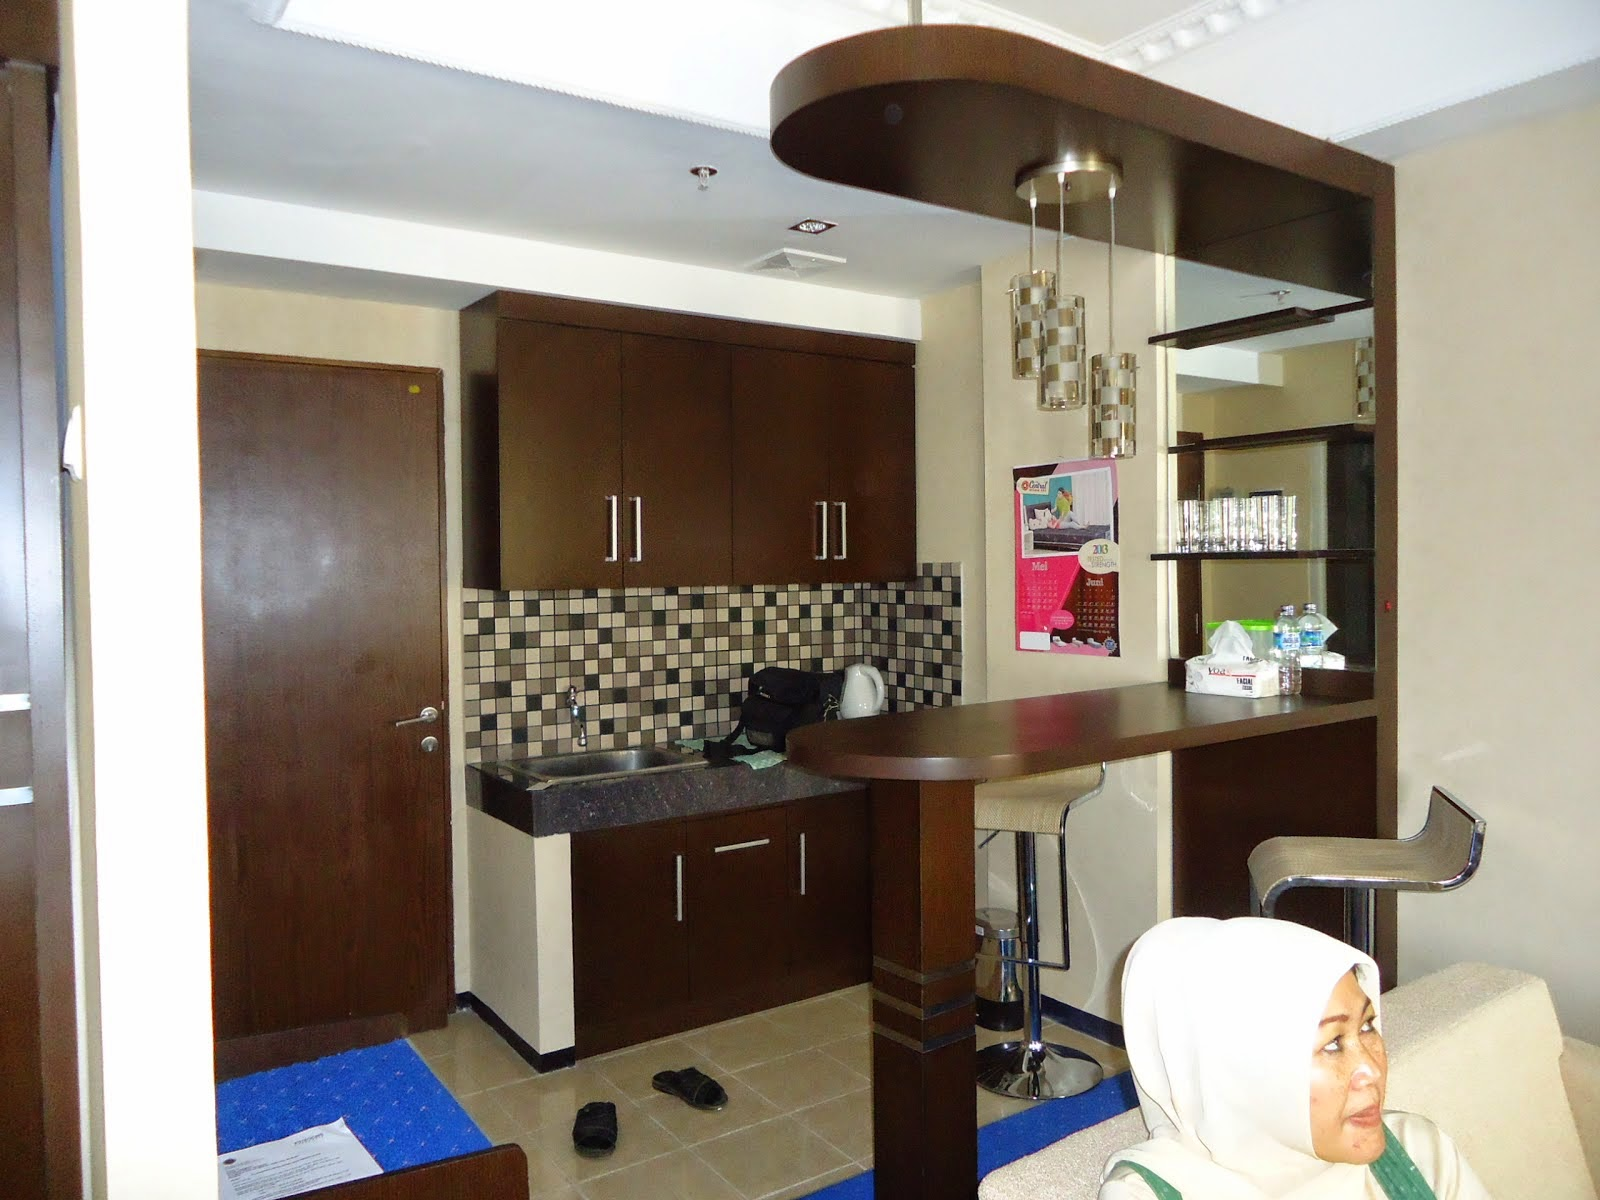 Harga kitchen set minimalis murah bandung jasa pembuatan for Harga kitchen set bandung